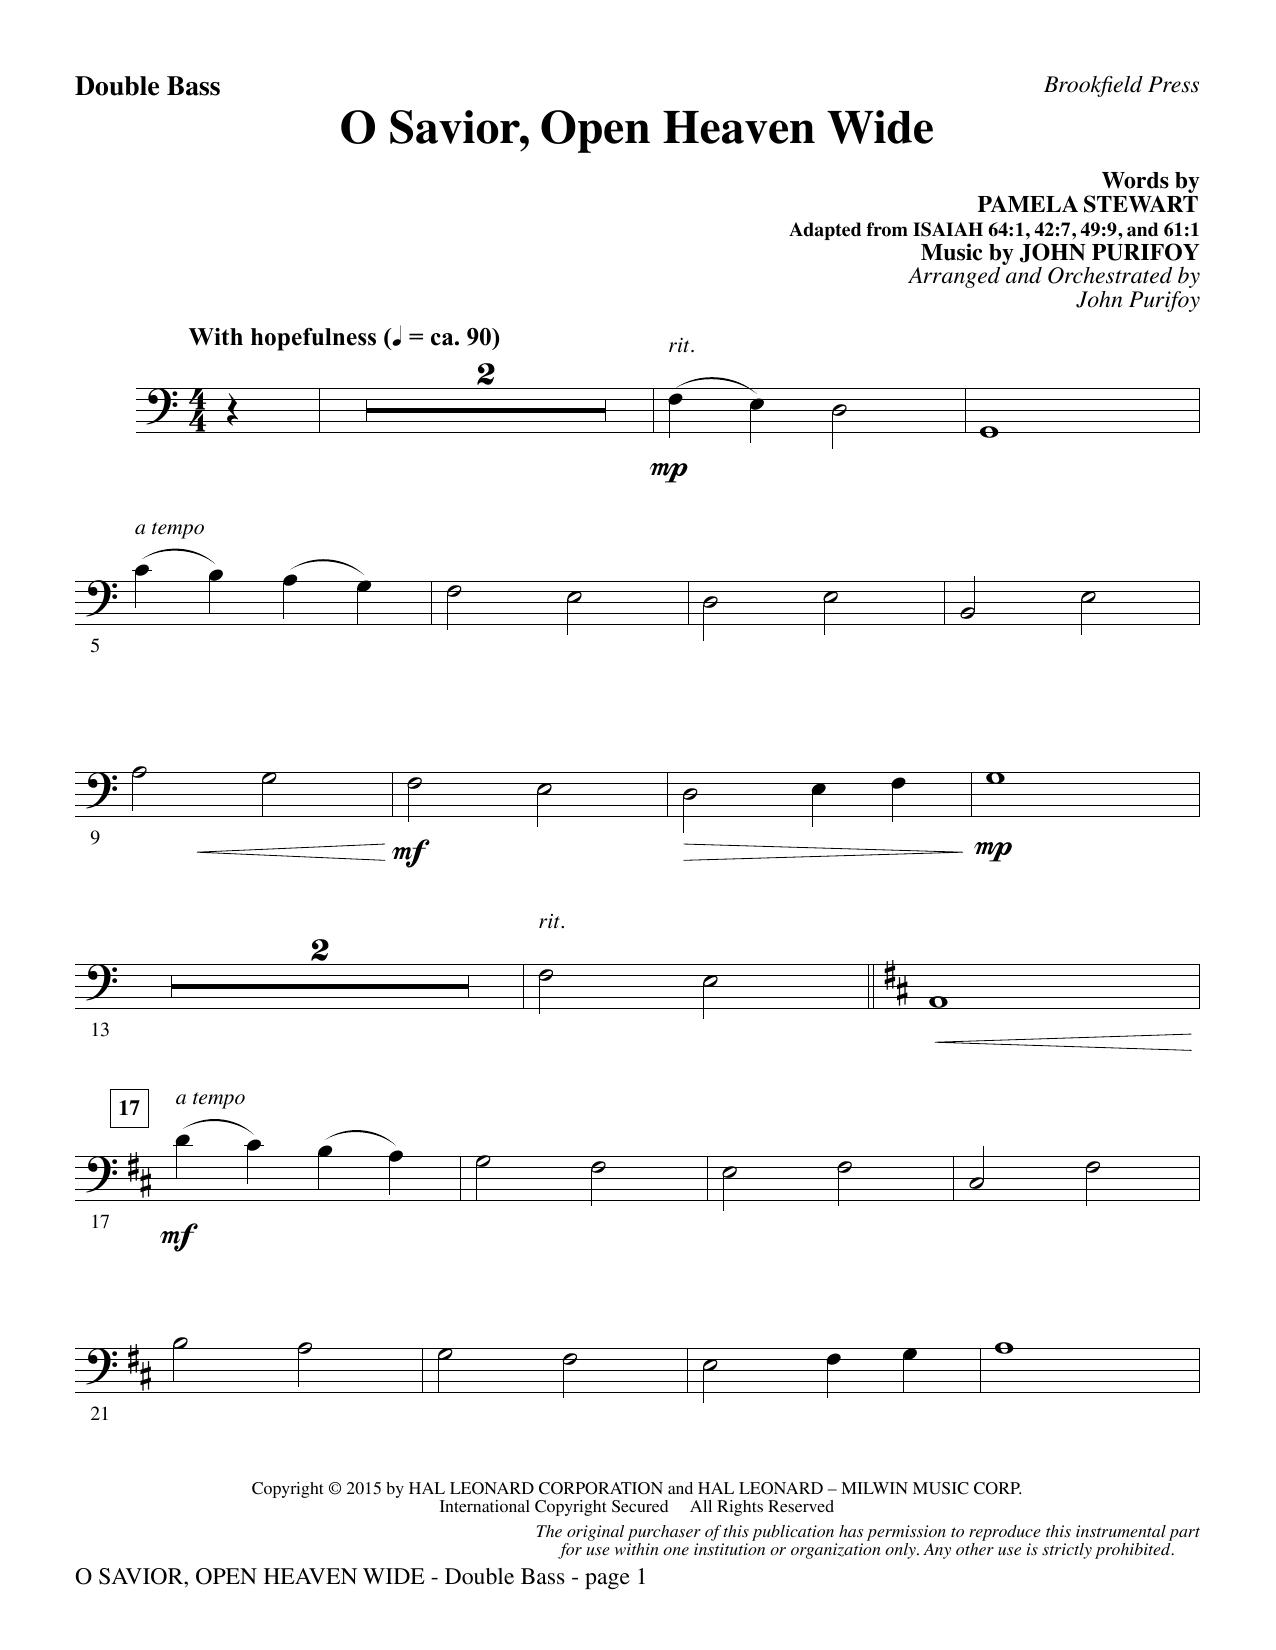 O Savior, Open Heaven Wide - Double Bass